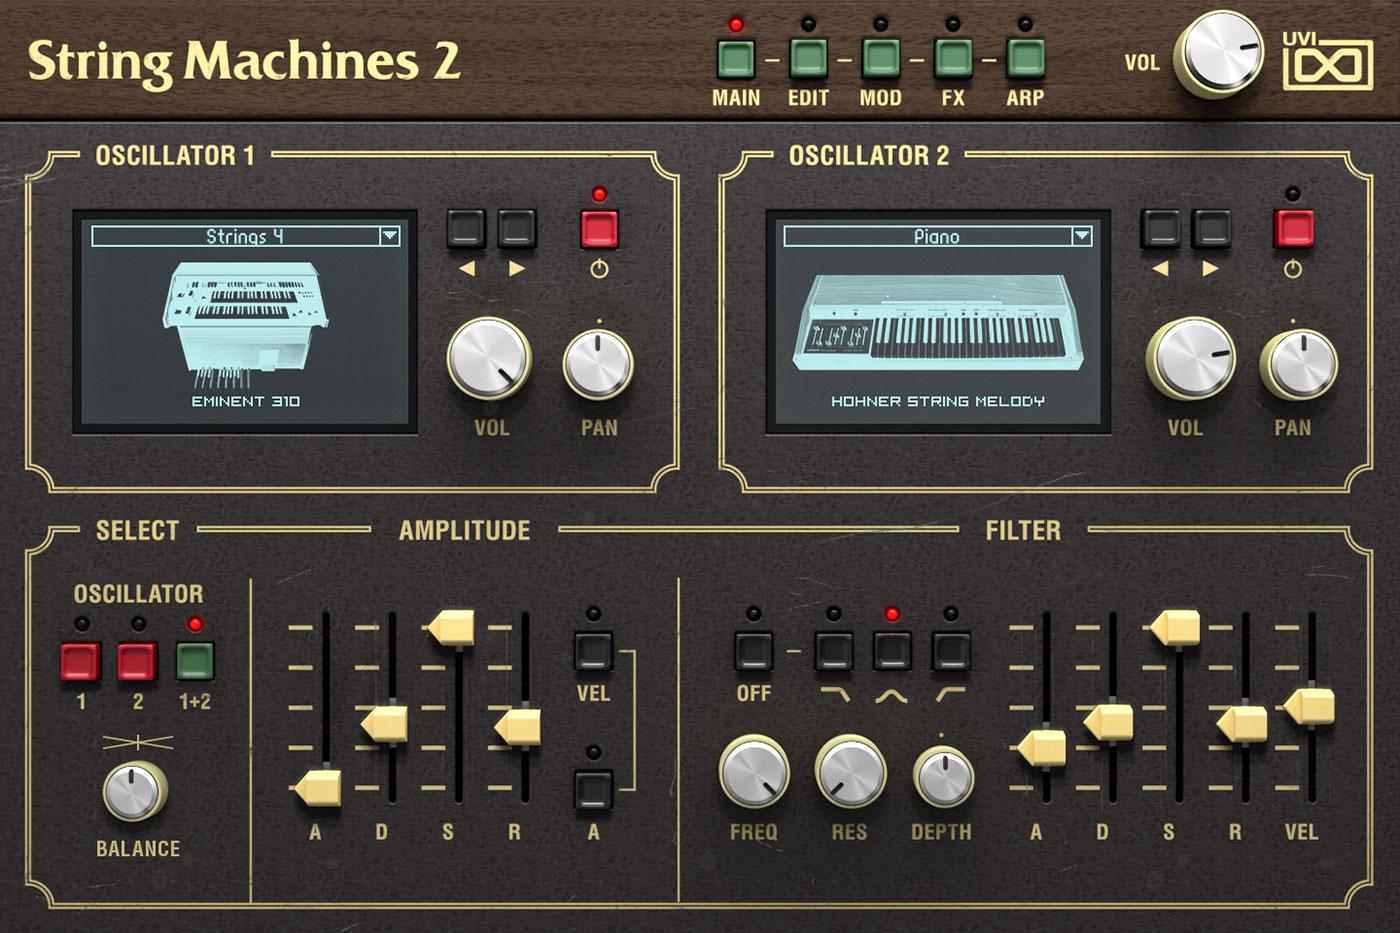 String-Machines-2_GUI_Main